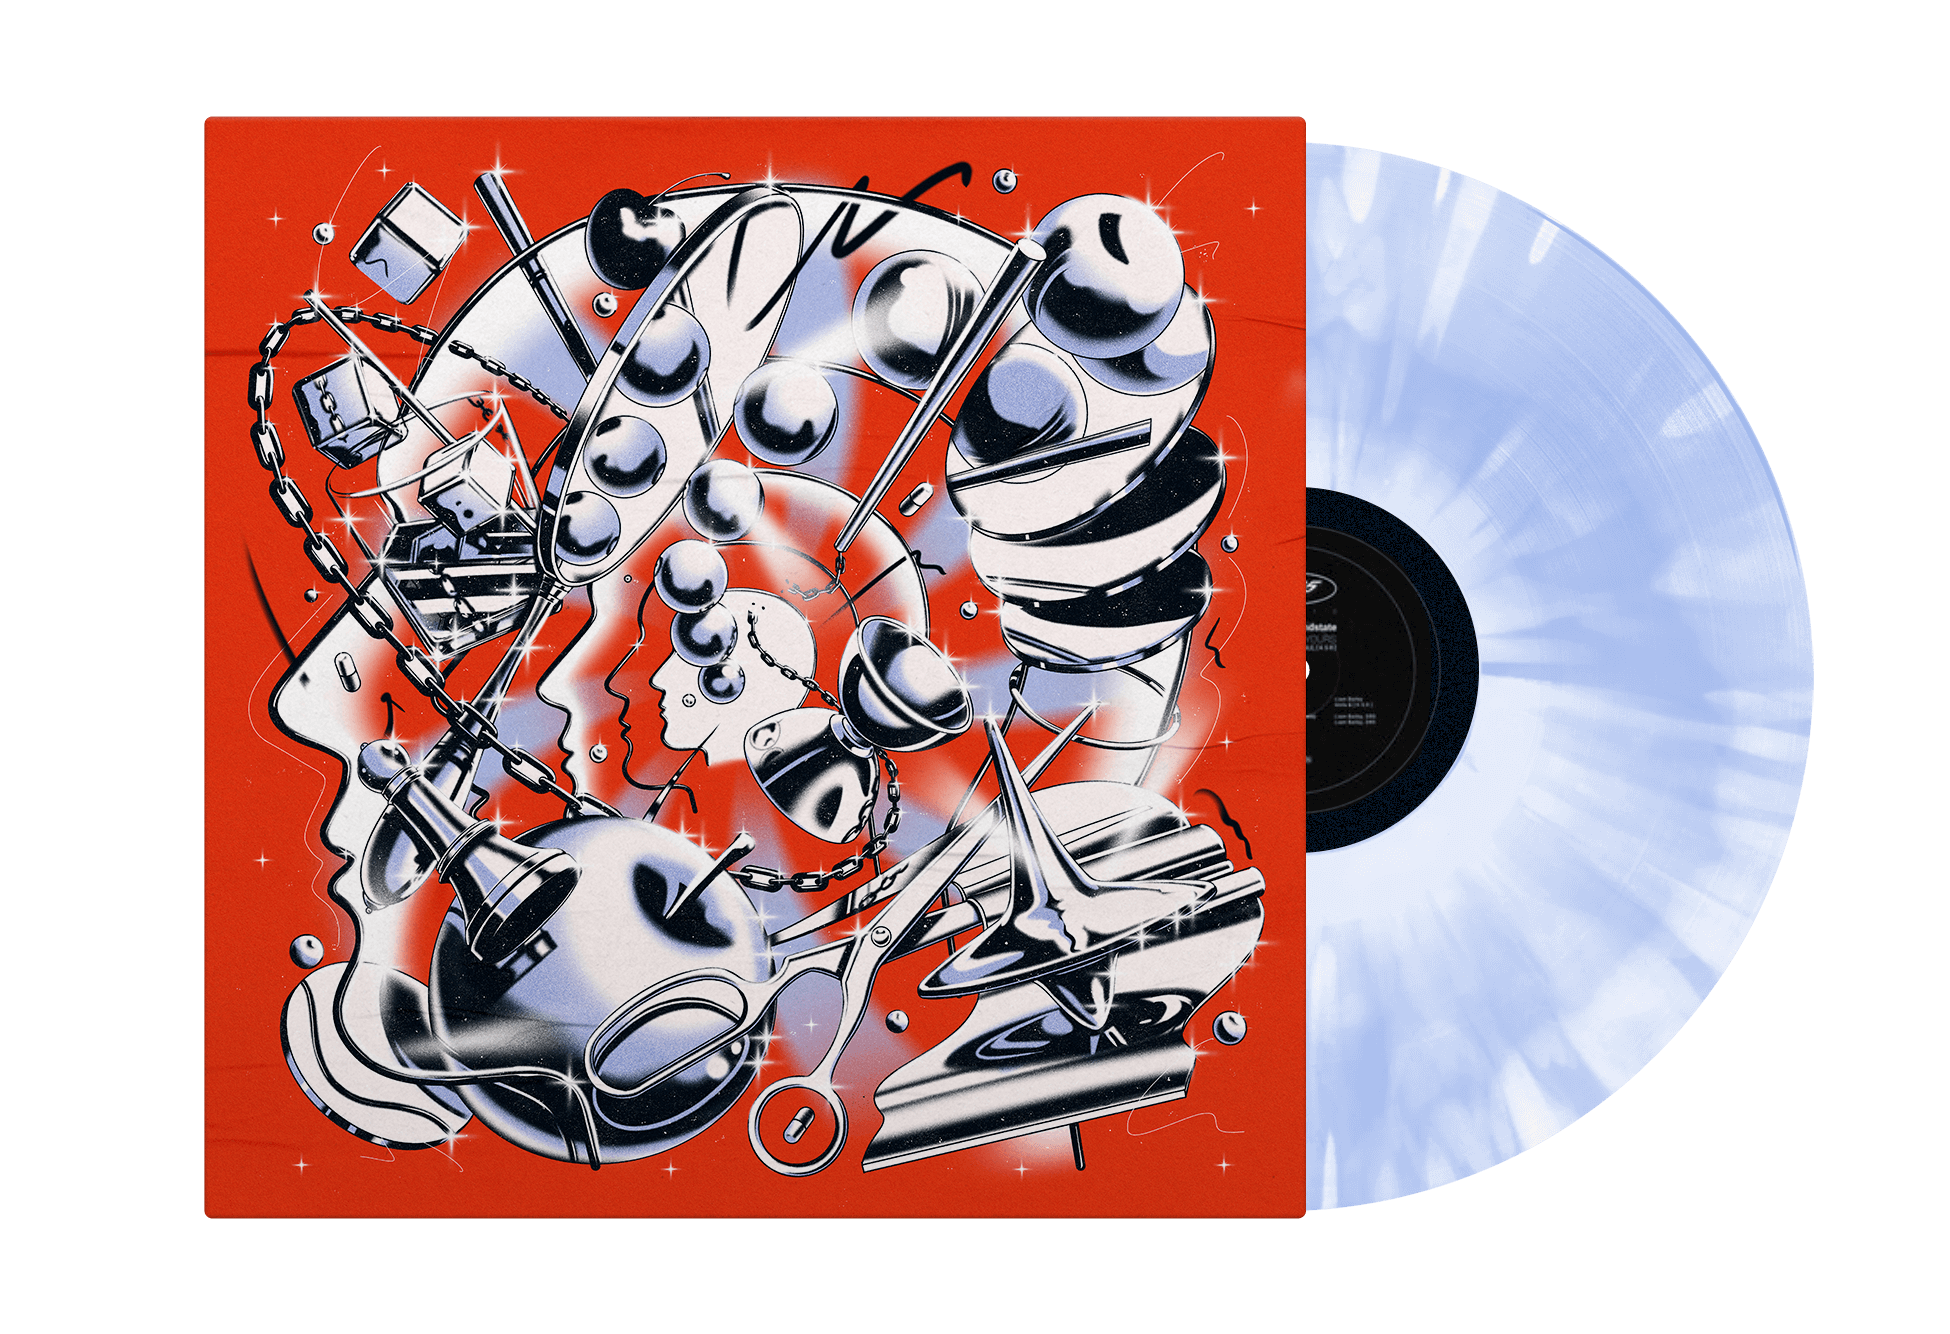 Vinyl-Record-PSD-MockUp-copy